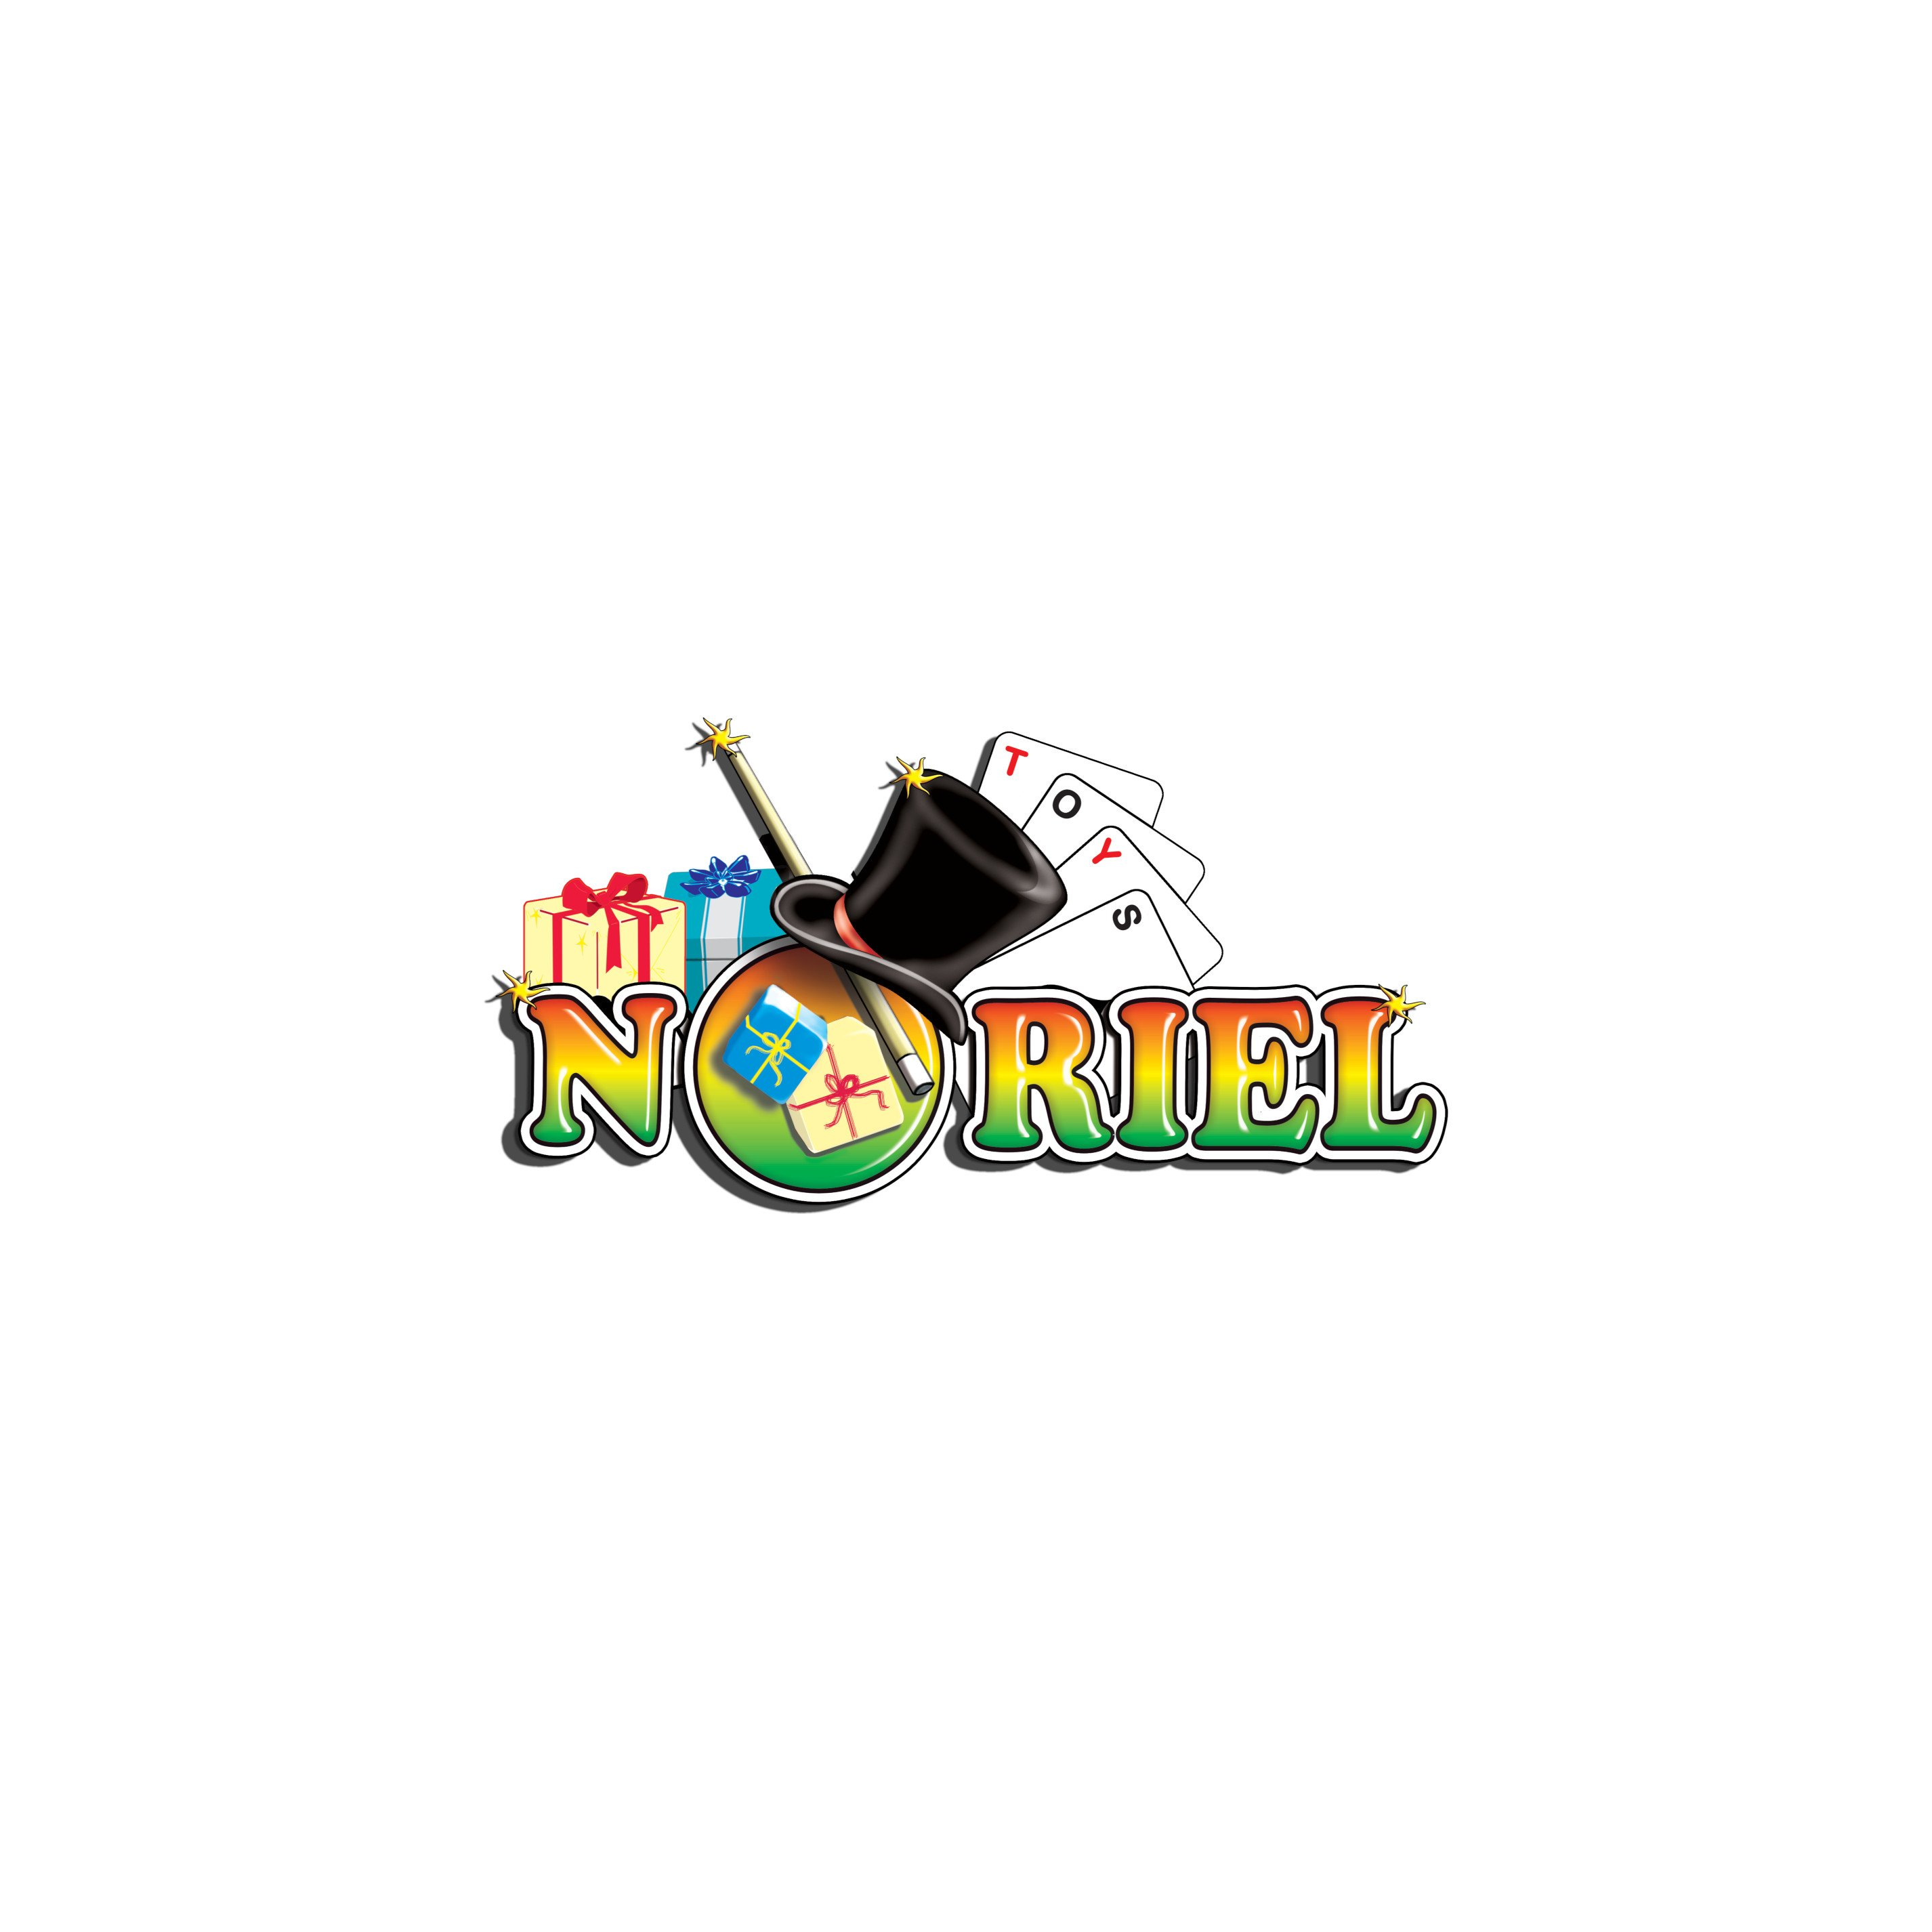 183940_001 Jucarie de plus cu functii Minnie Roadster Races